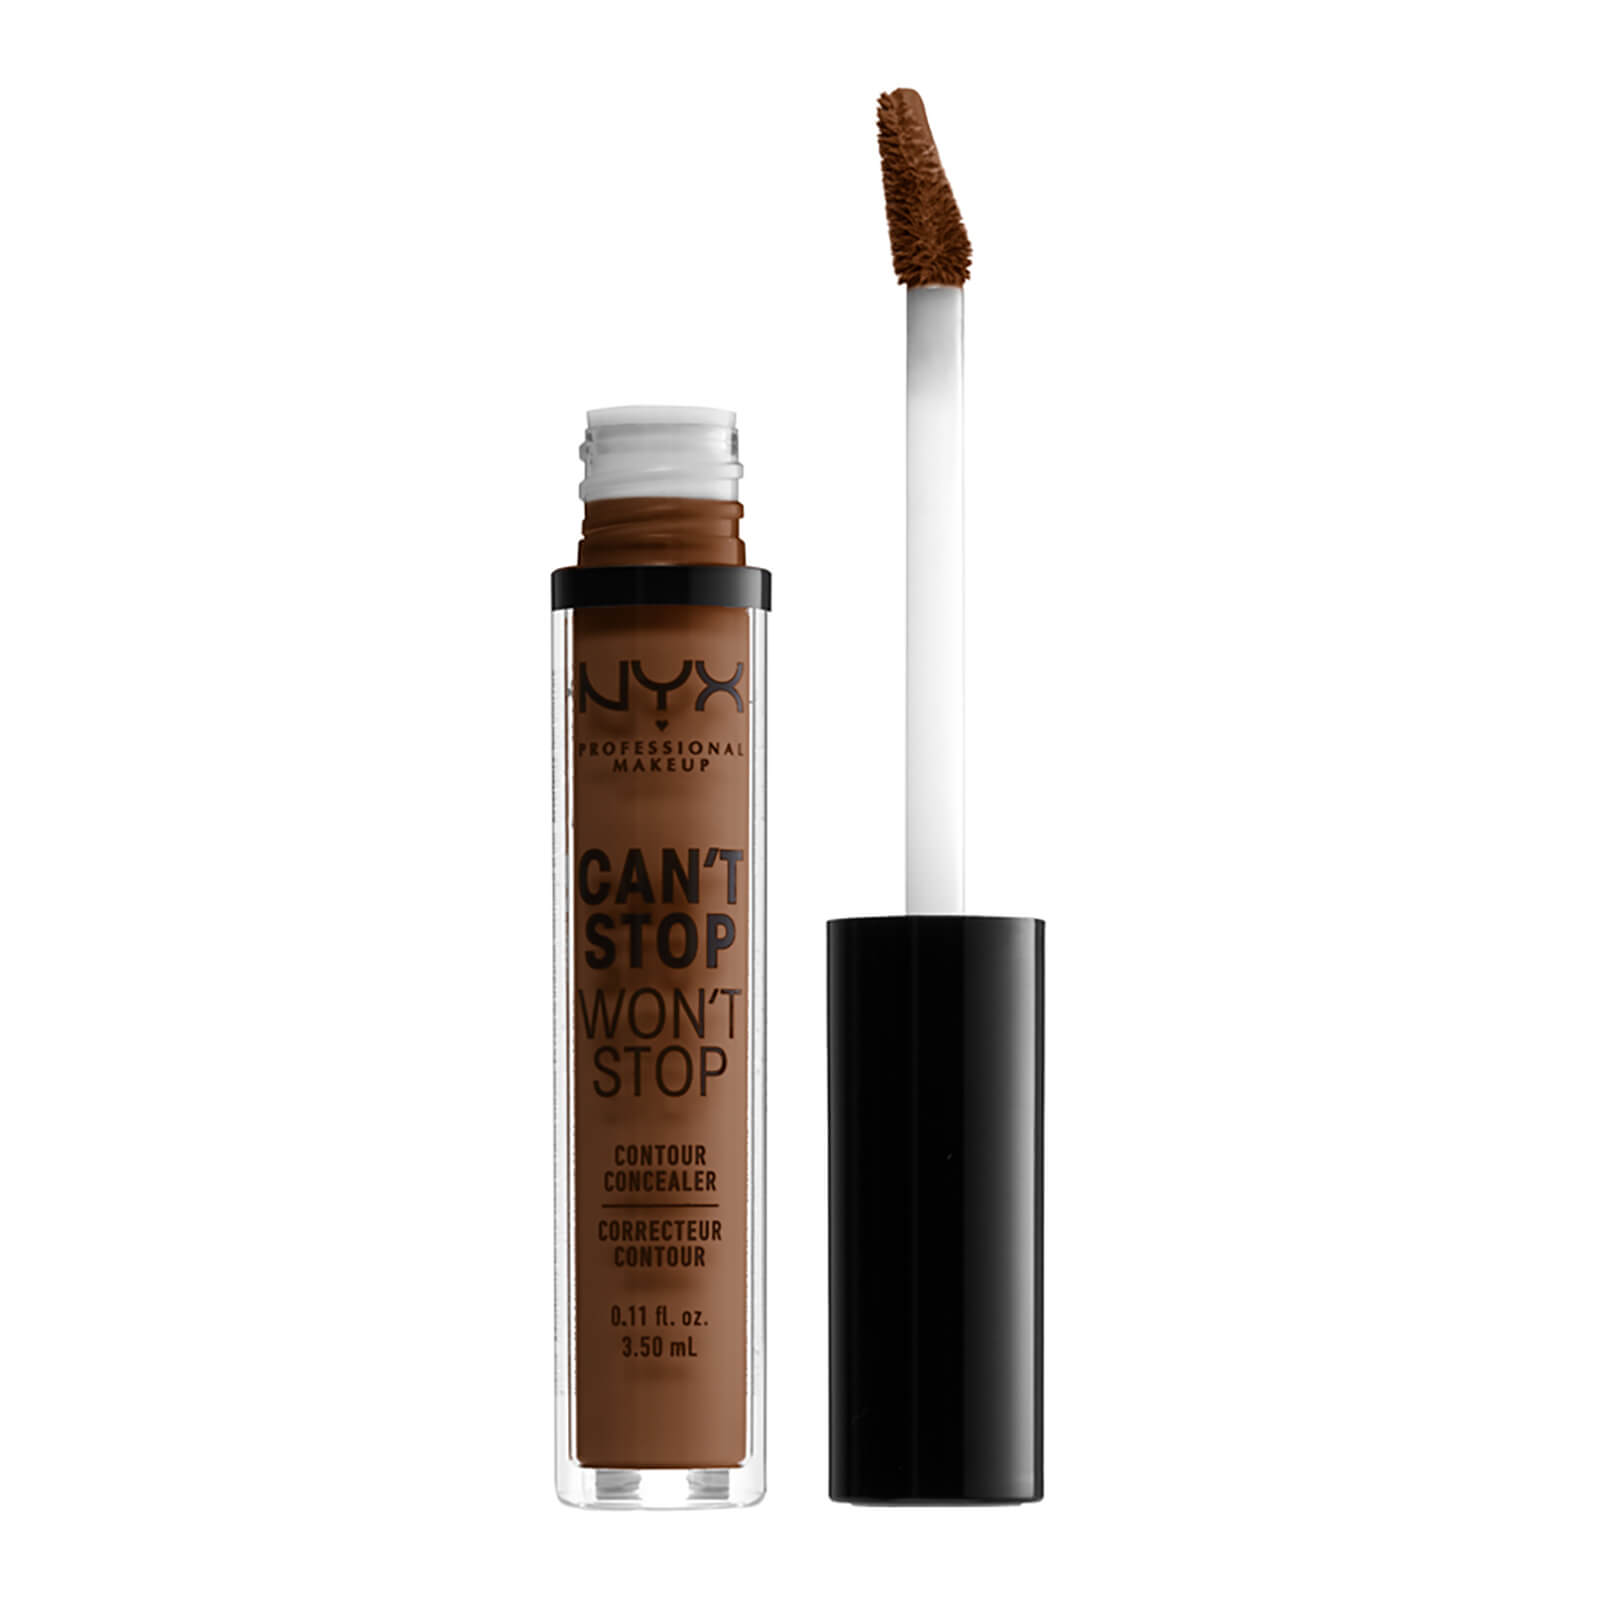 NYX Professional Makeup Can't Stop Won't Stop Contour Concealer (Various Shades) - Mocha